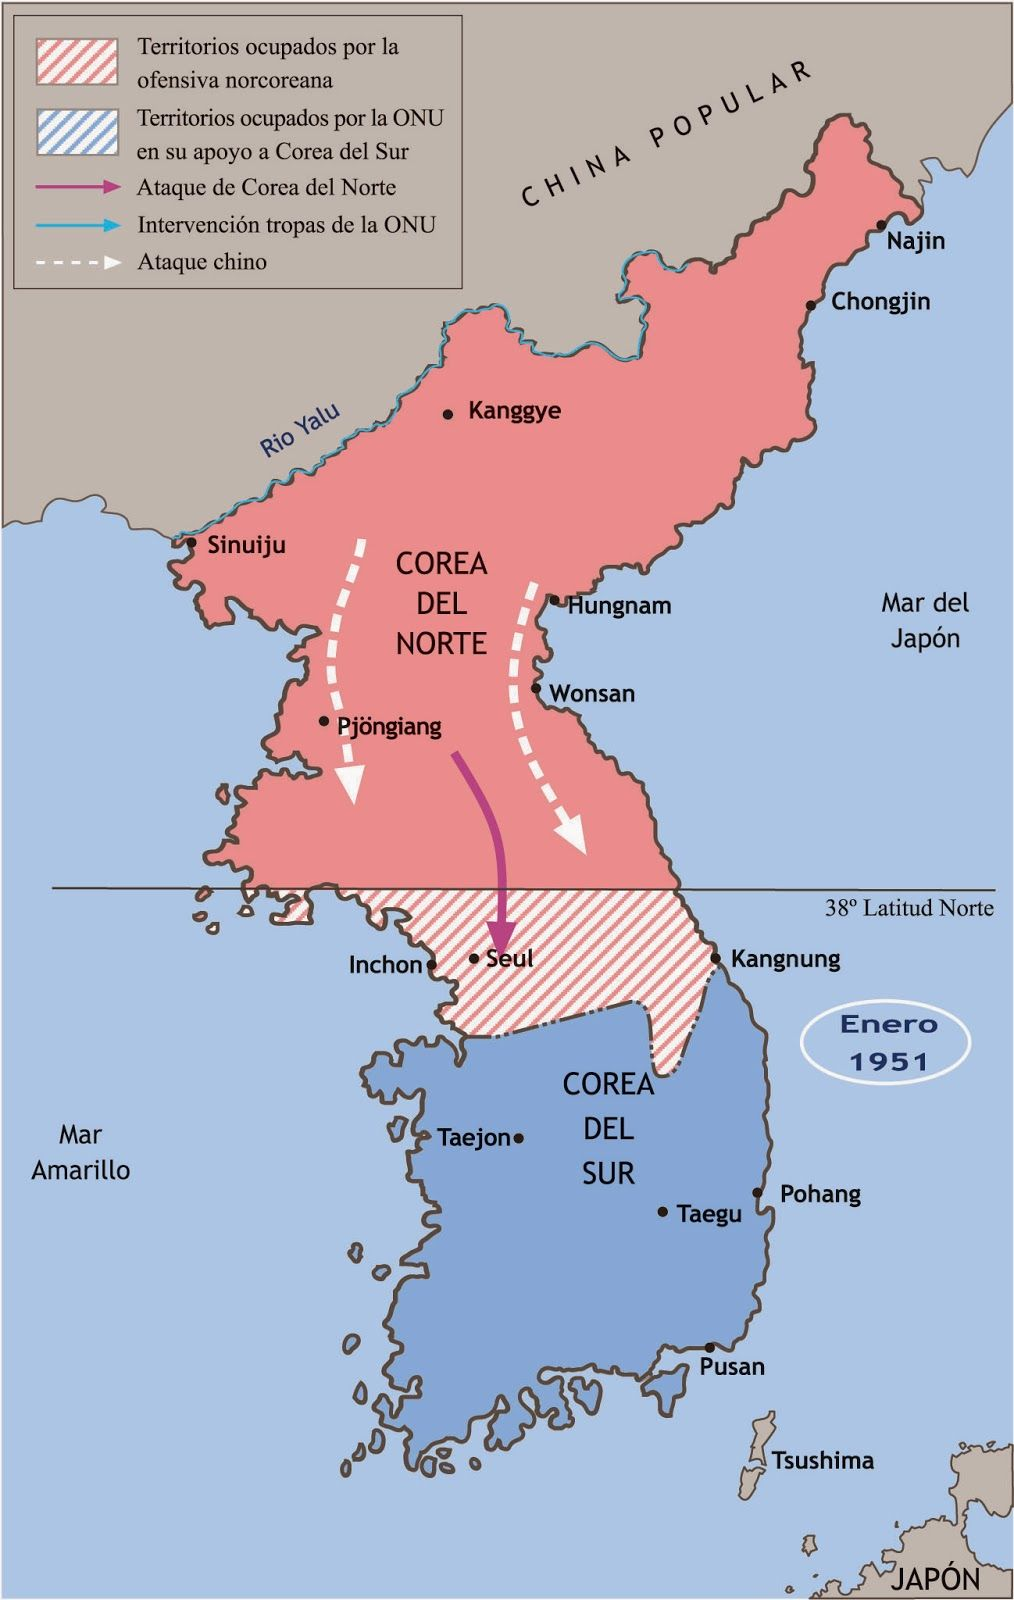 Guerra De Corea Mapa.Pin En Le Pouvoir